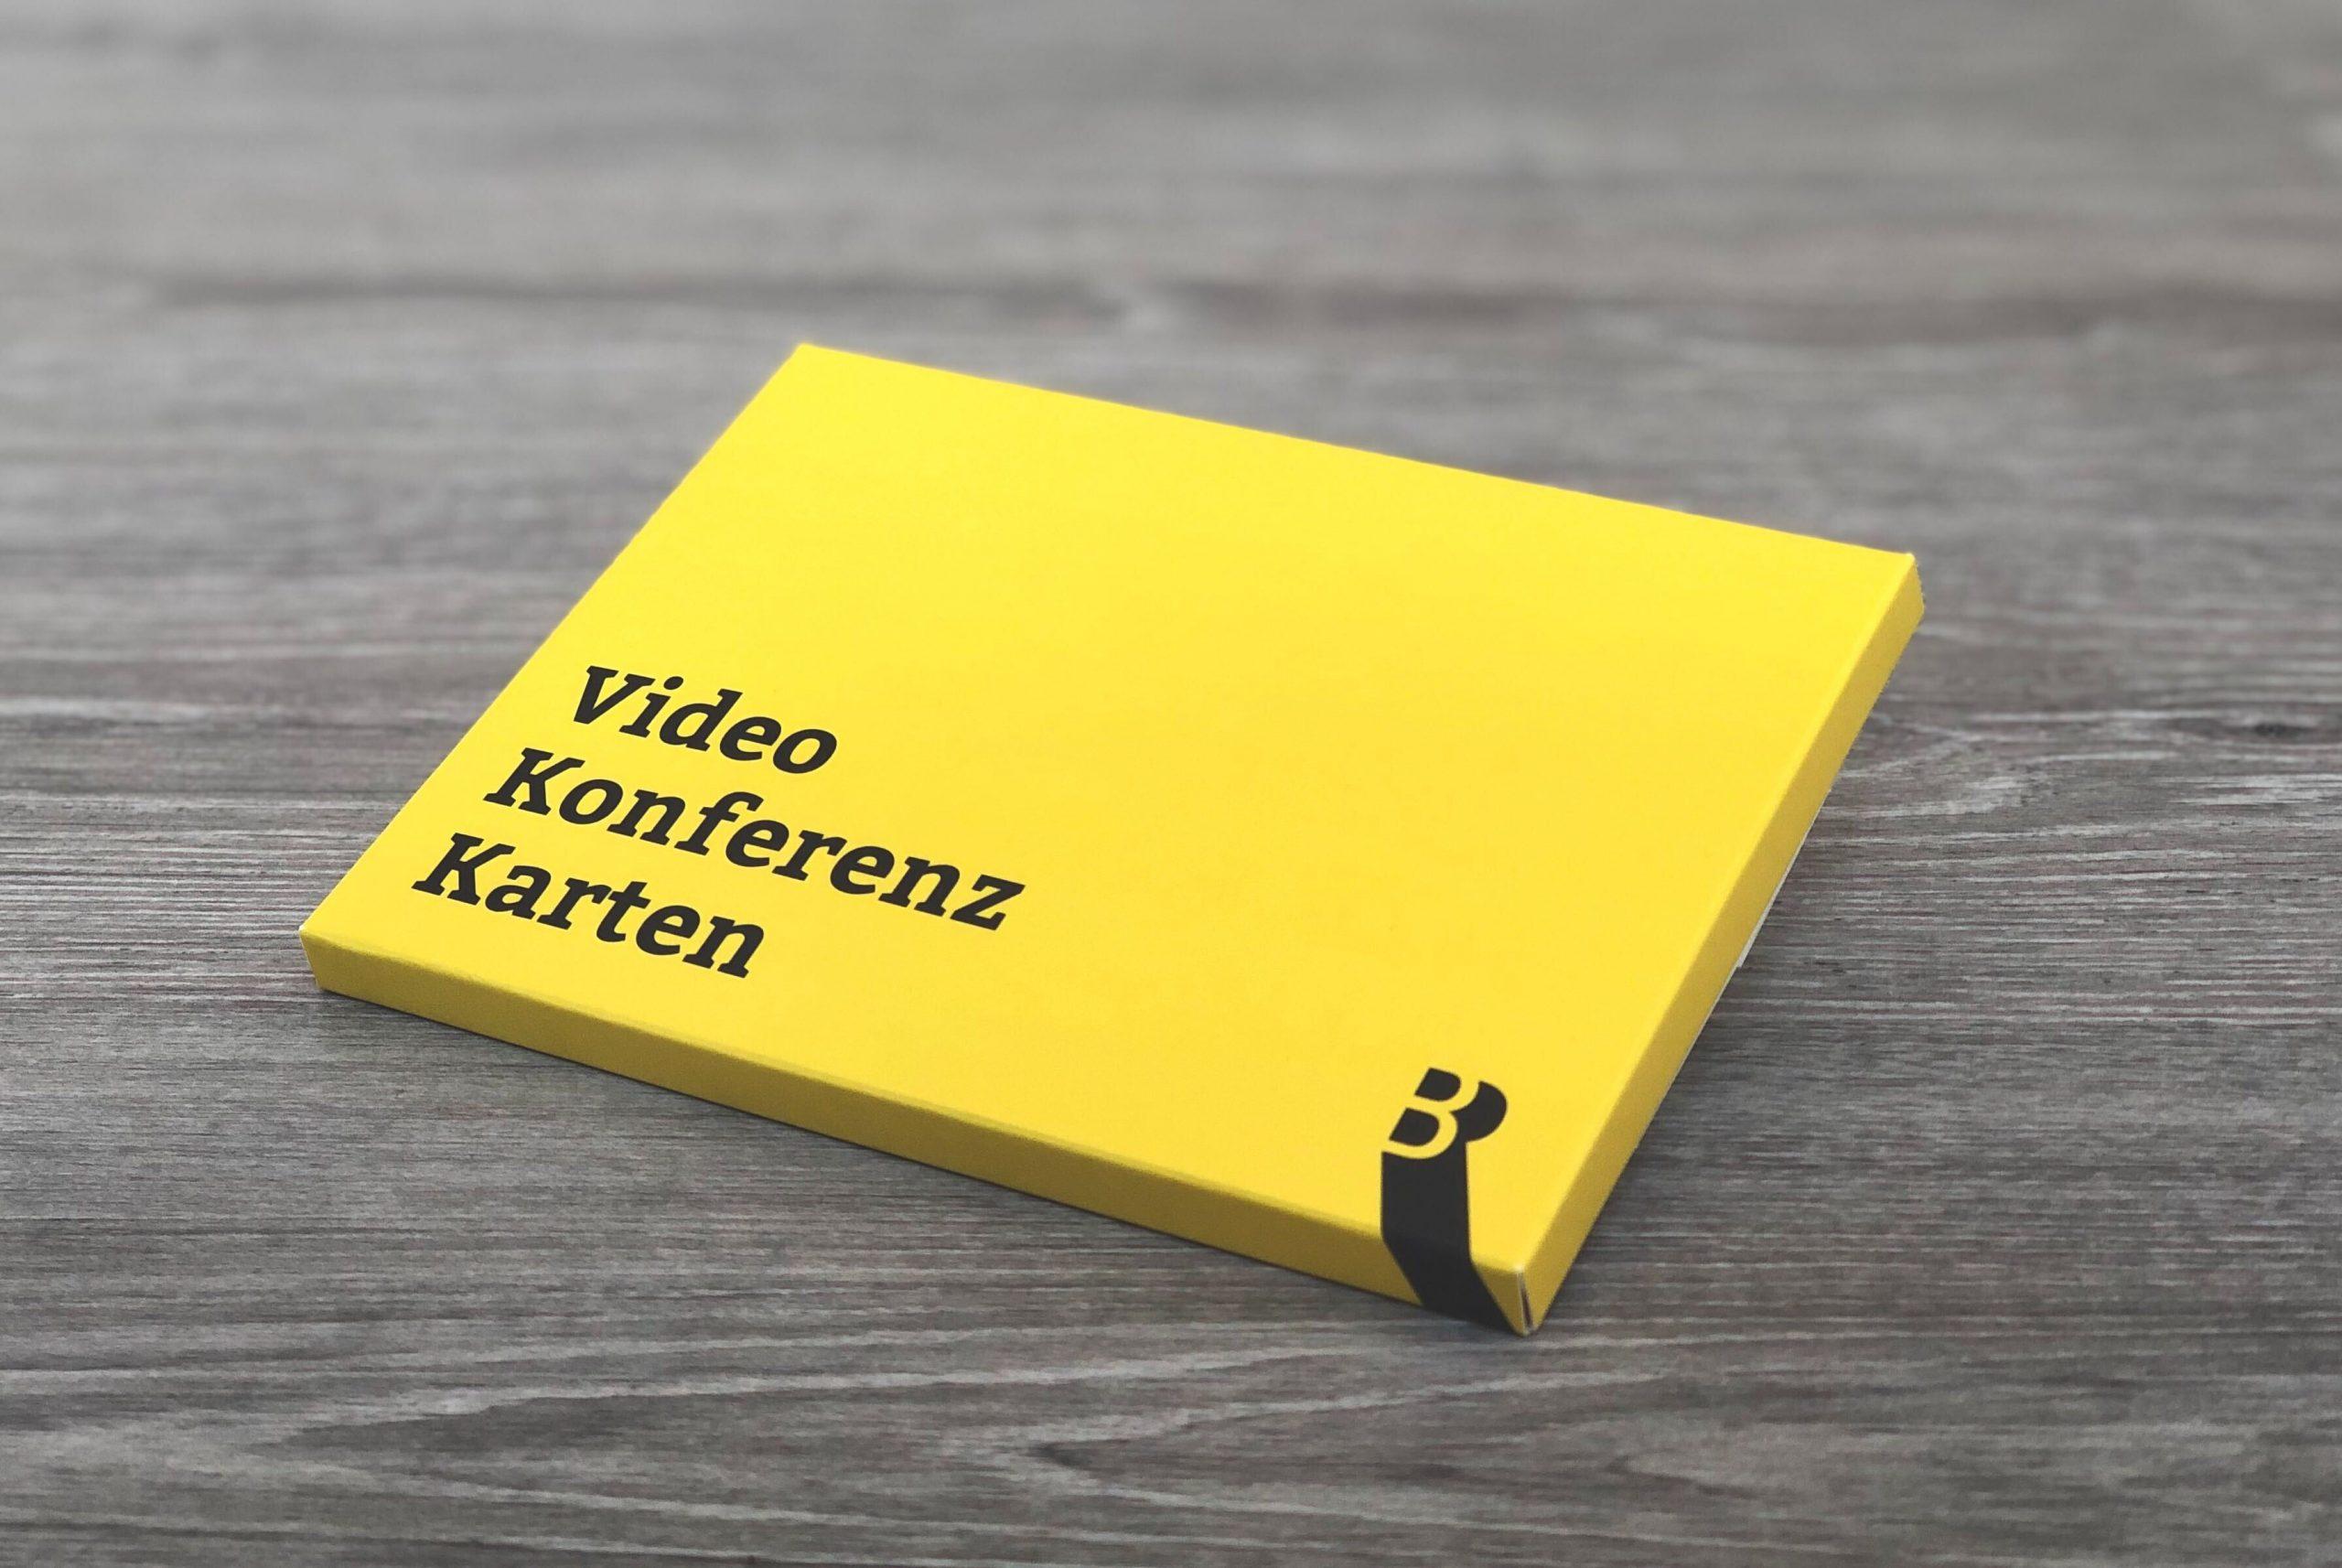 Video-Konferenz-Karten-Set